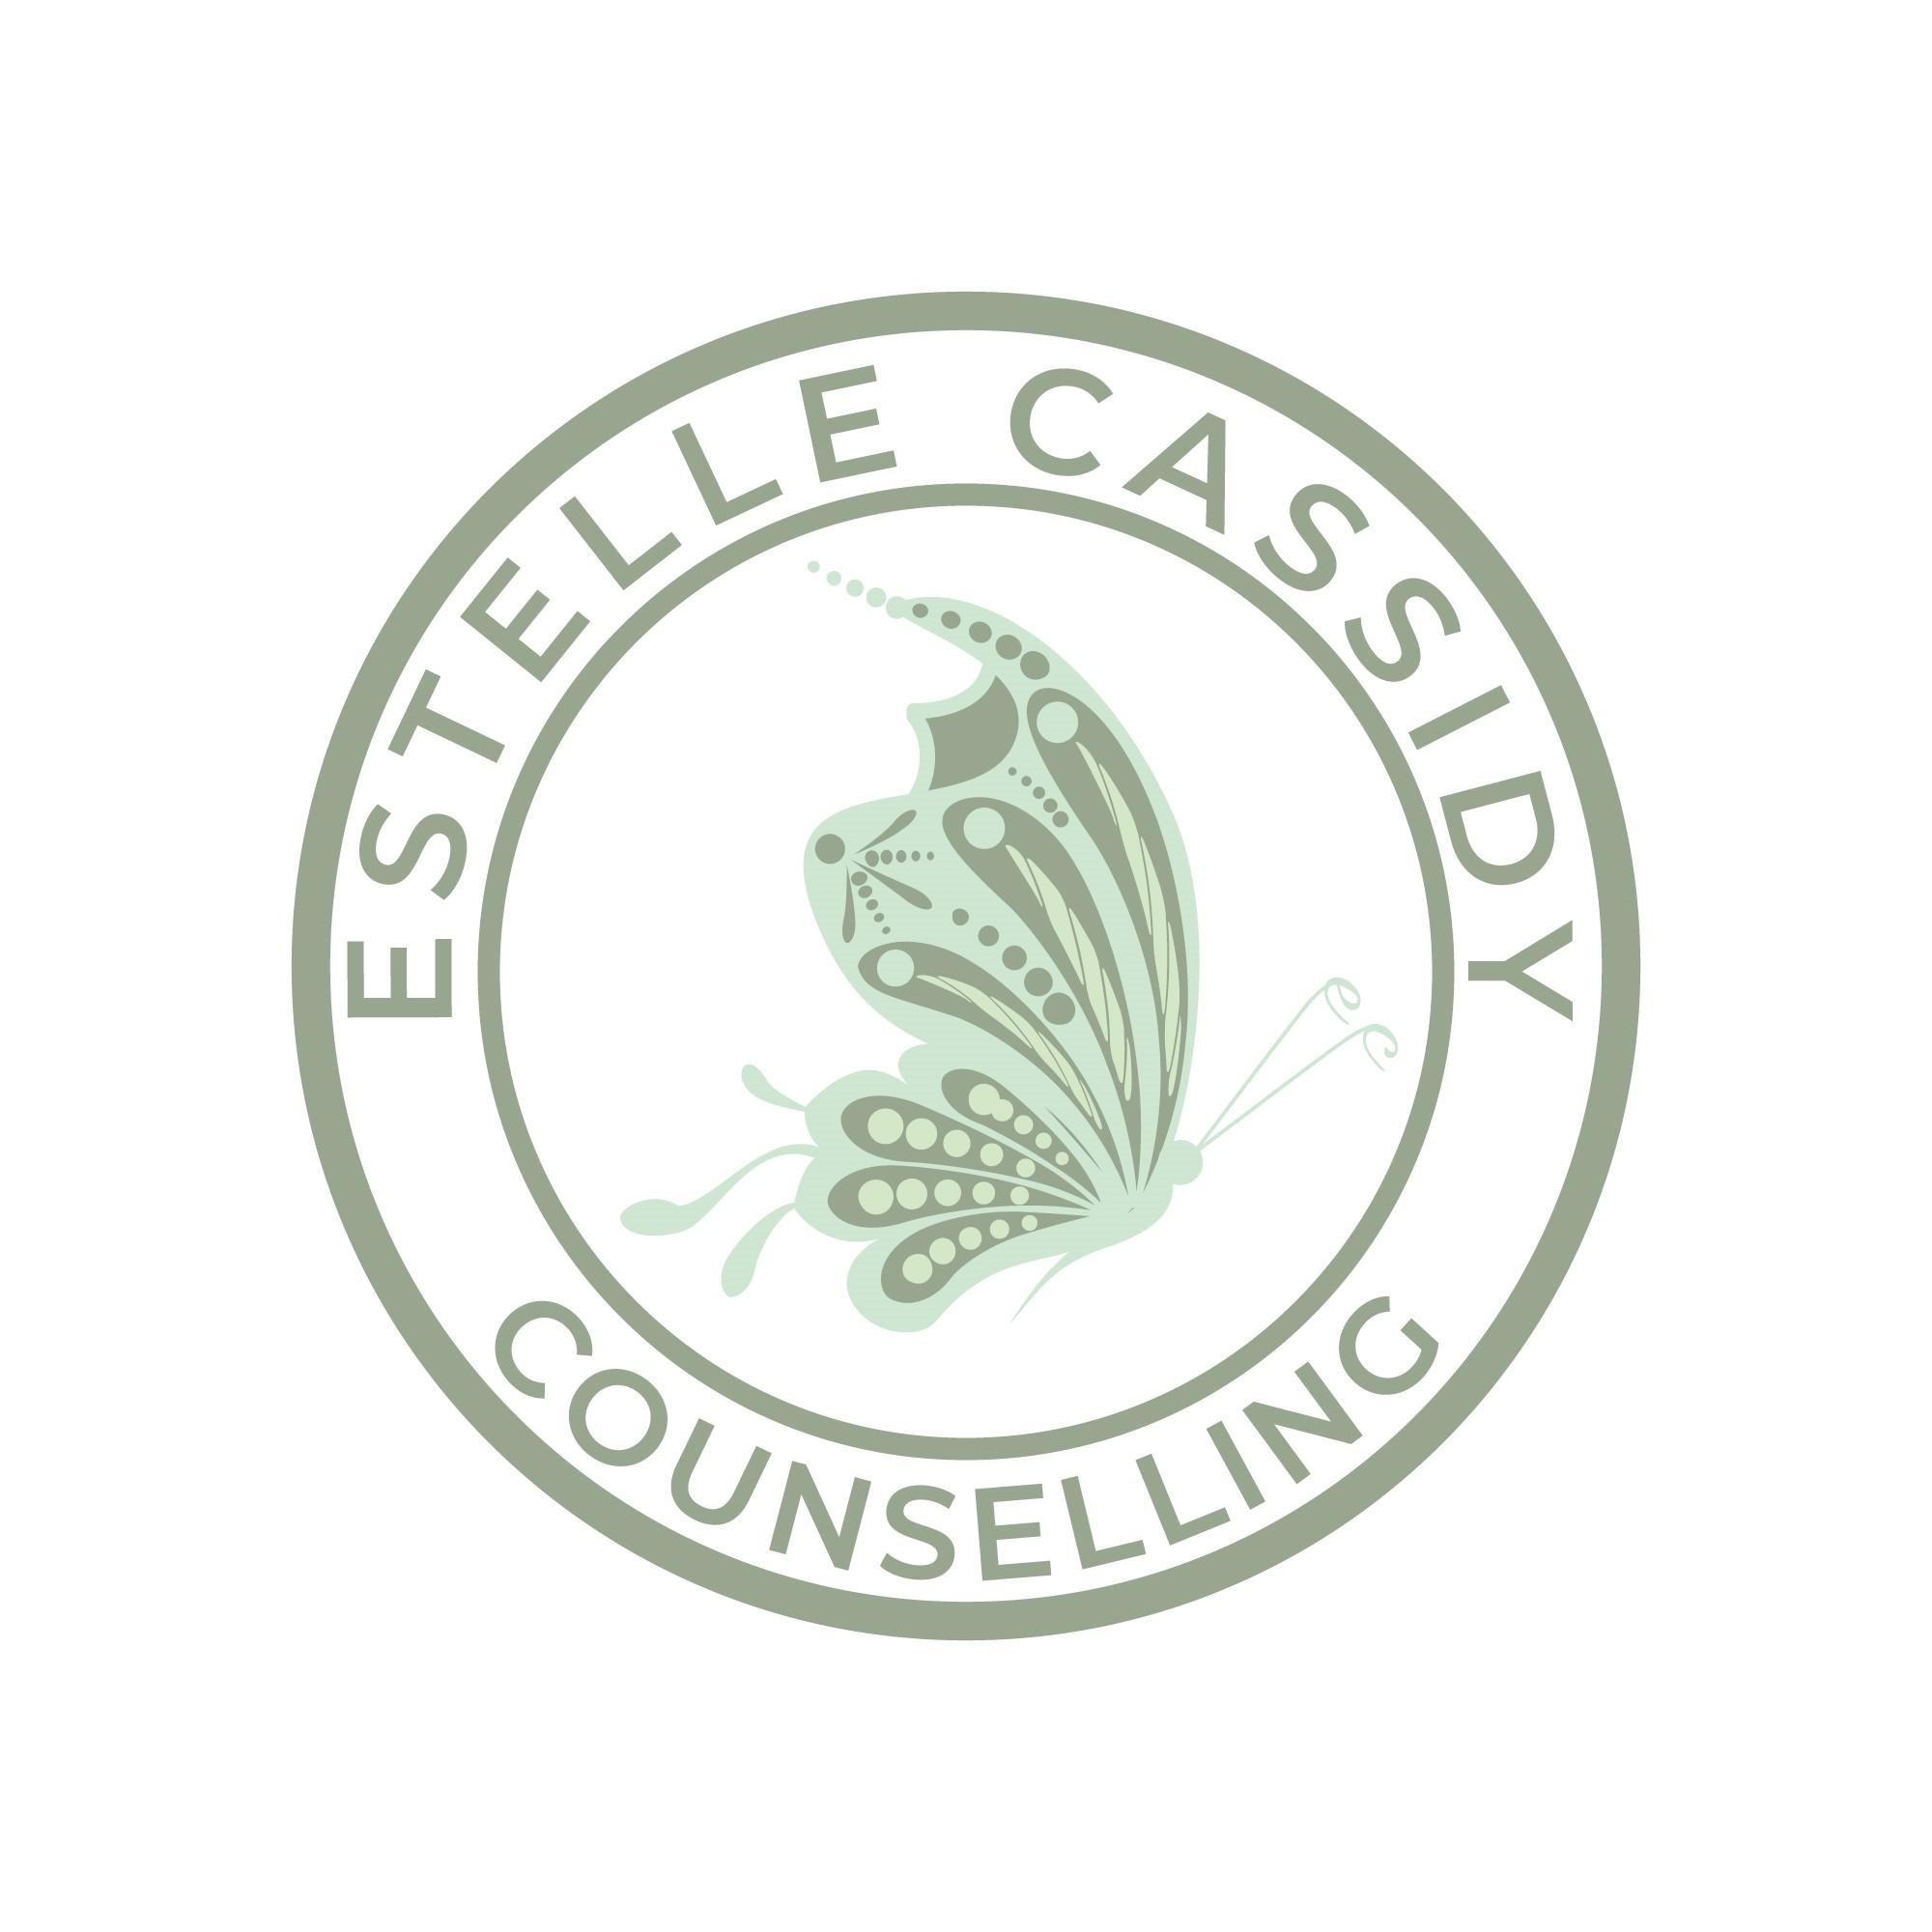 Estelle Cassidy